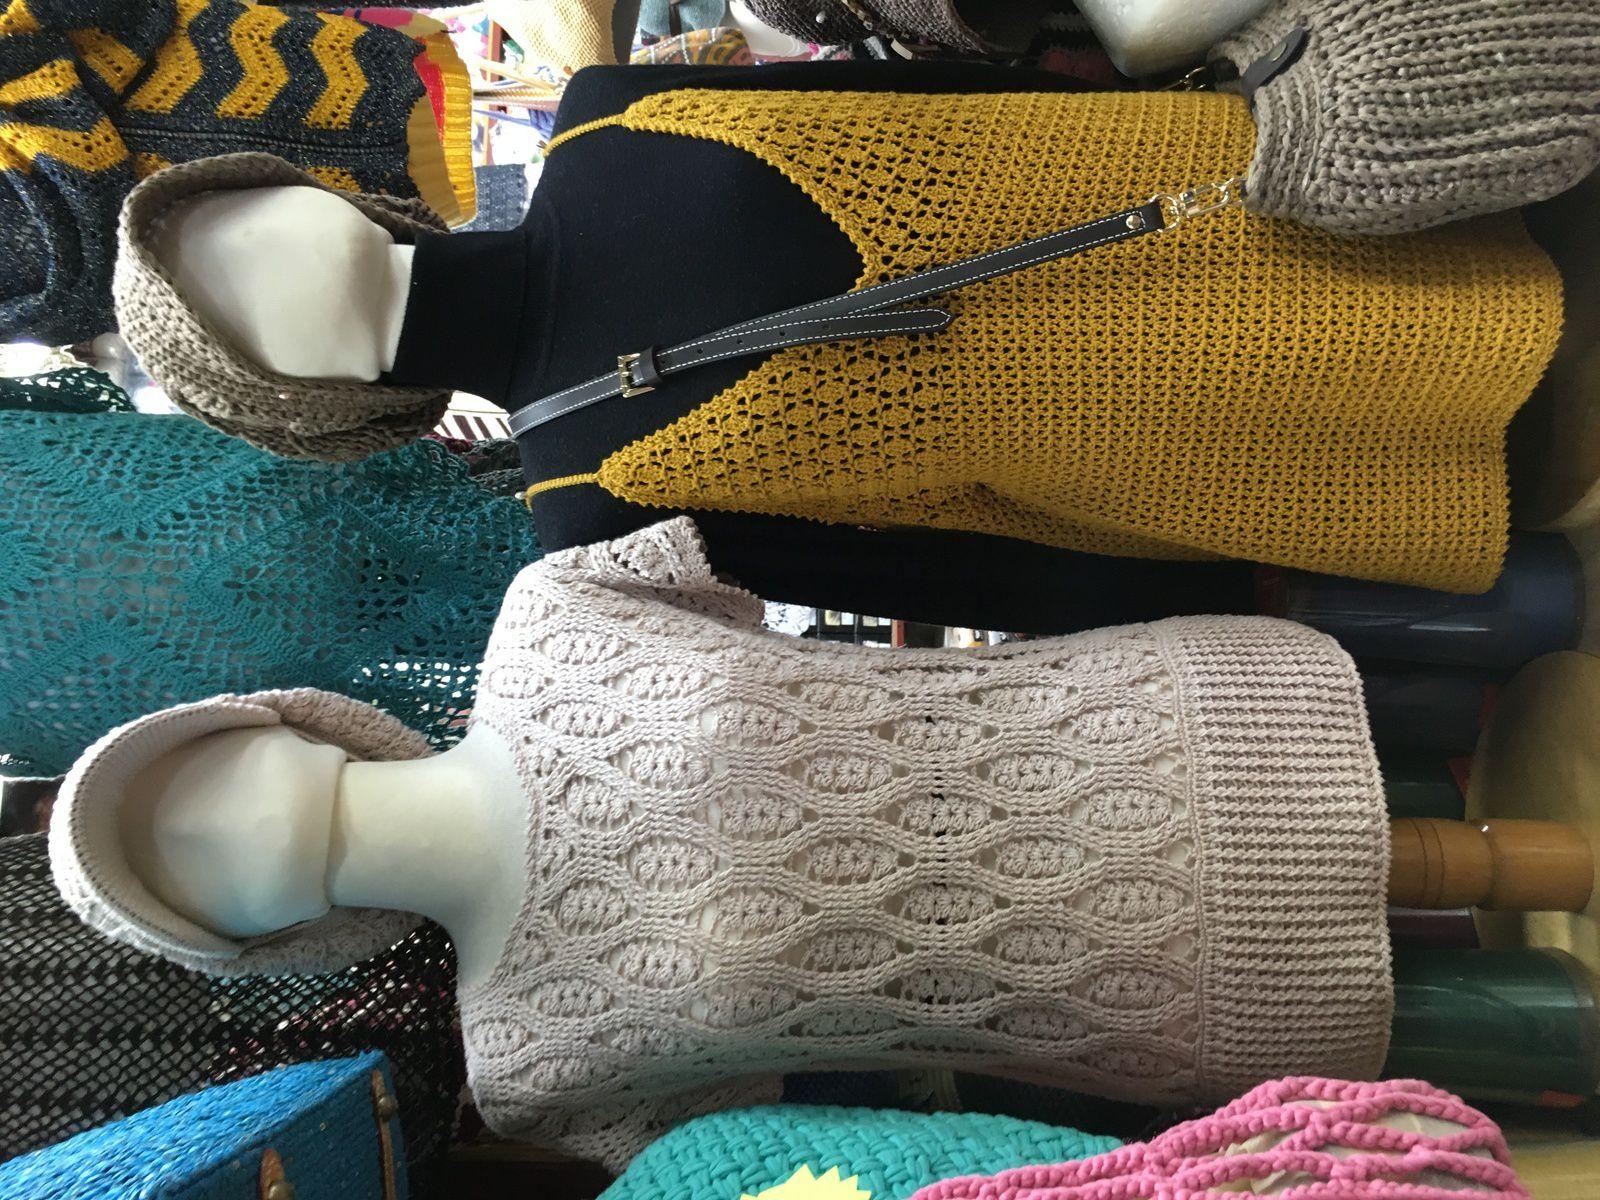 Laine à Séoul : Dongdaemum Market or yarn in Seoul